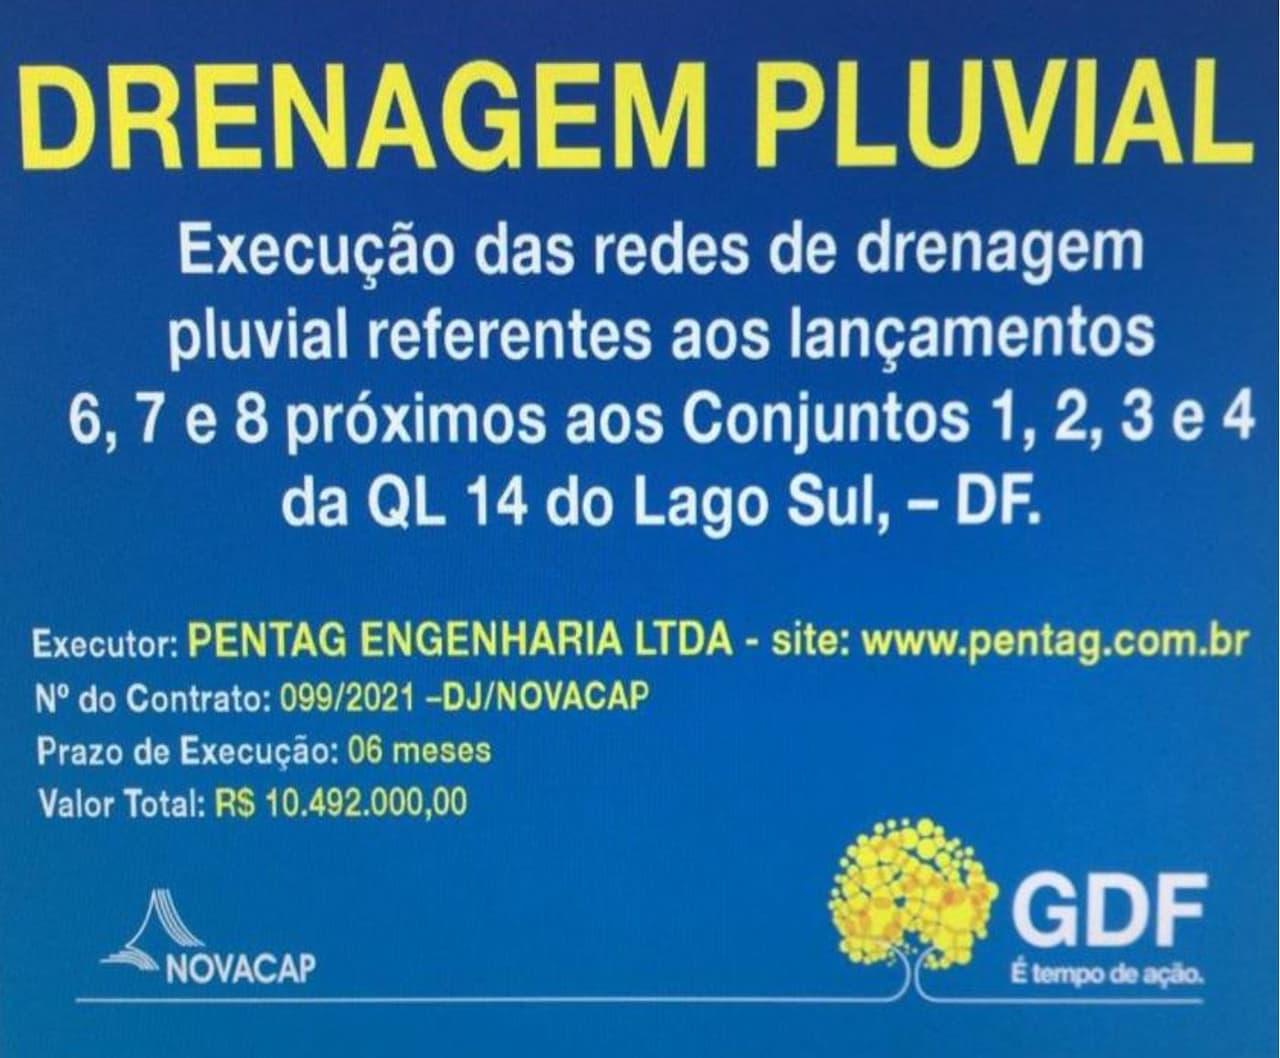 banner-drenagem-pluvial-ql14-lago-sul-NOVACAP-GDF (1)